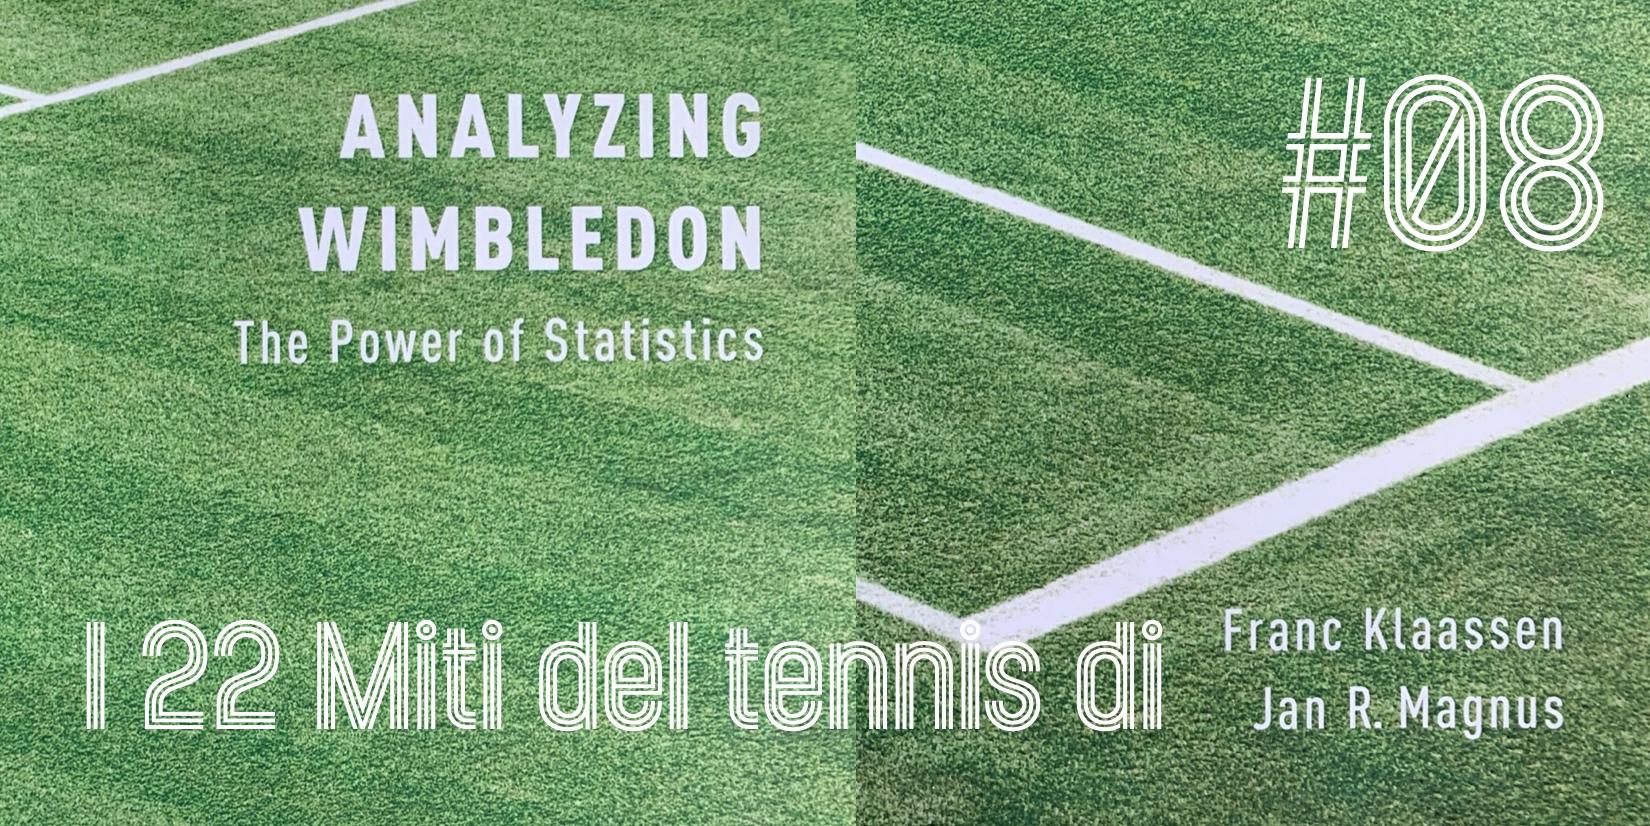 I 22 miti del tennis di Klaassen & Magnus – Mito 8 - settesei.it